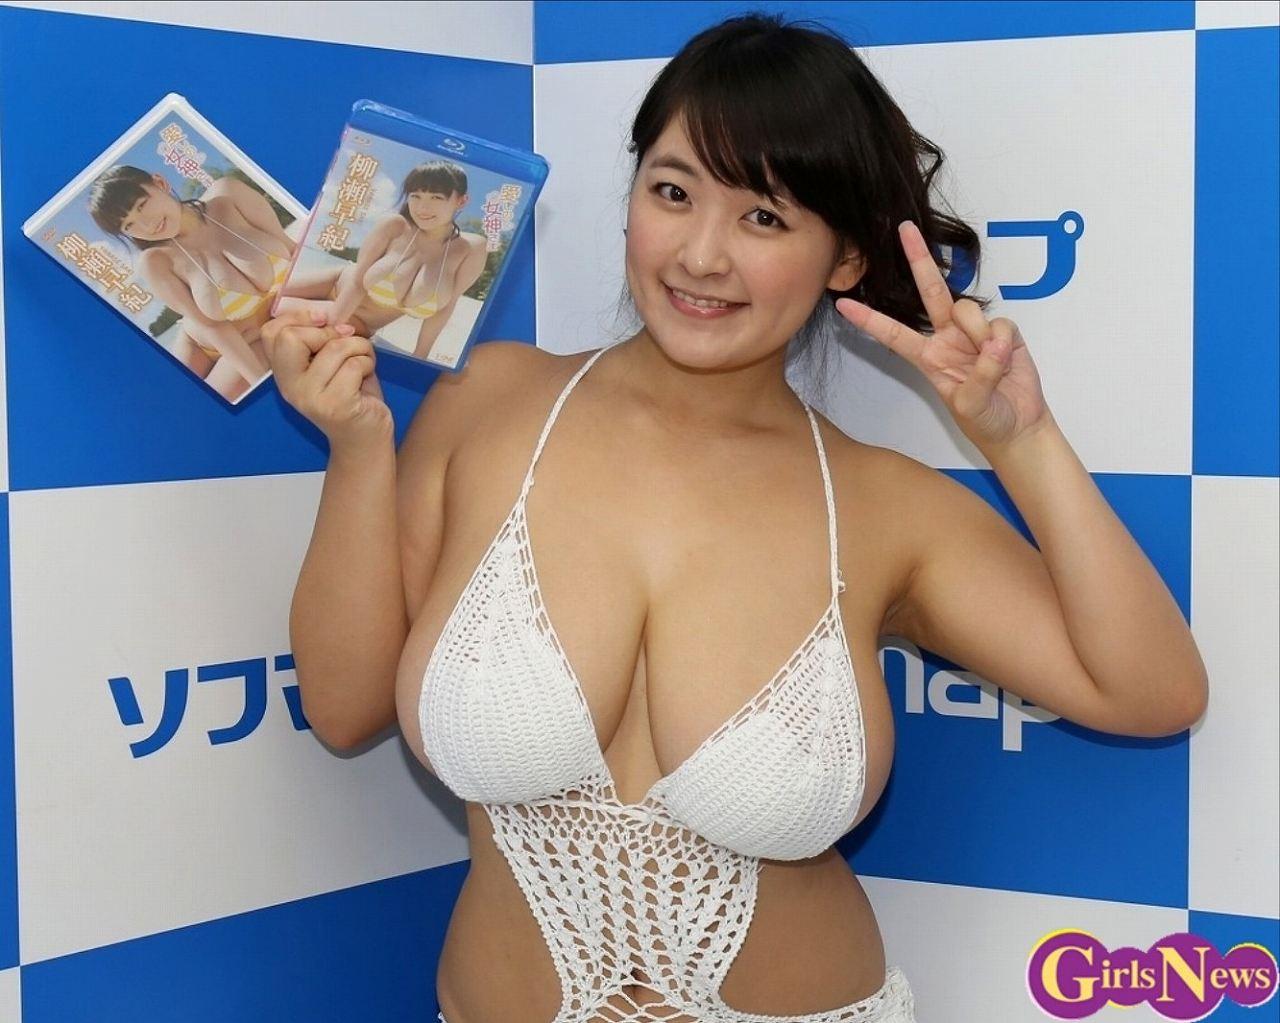 DVDの発売記念イベントでソフマップに登場した柳瀬早紀